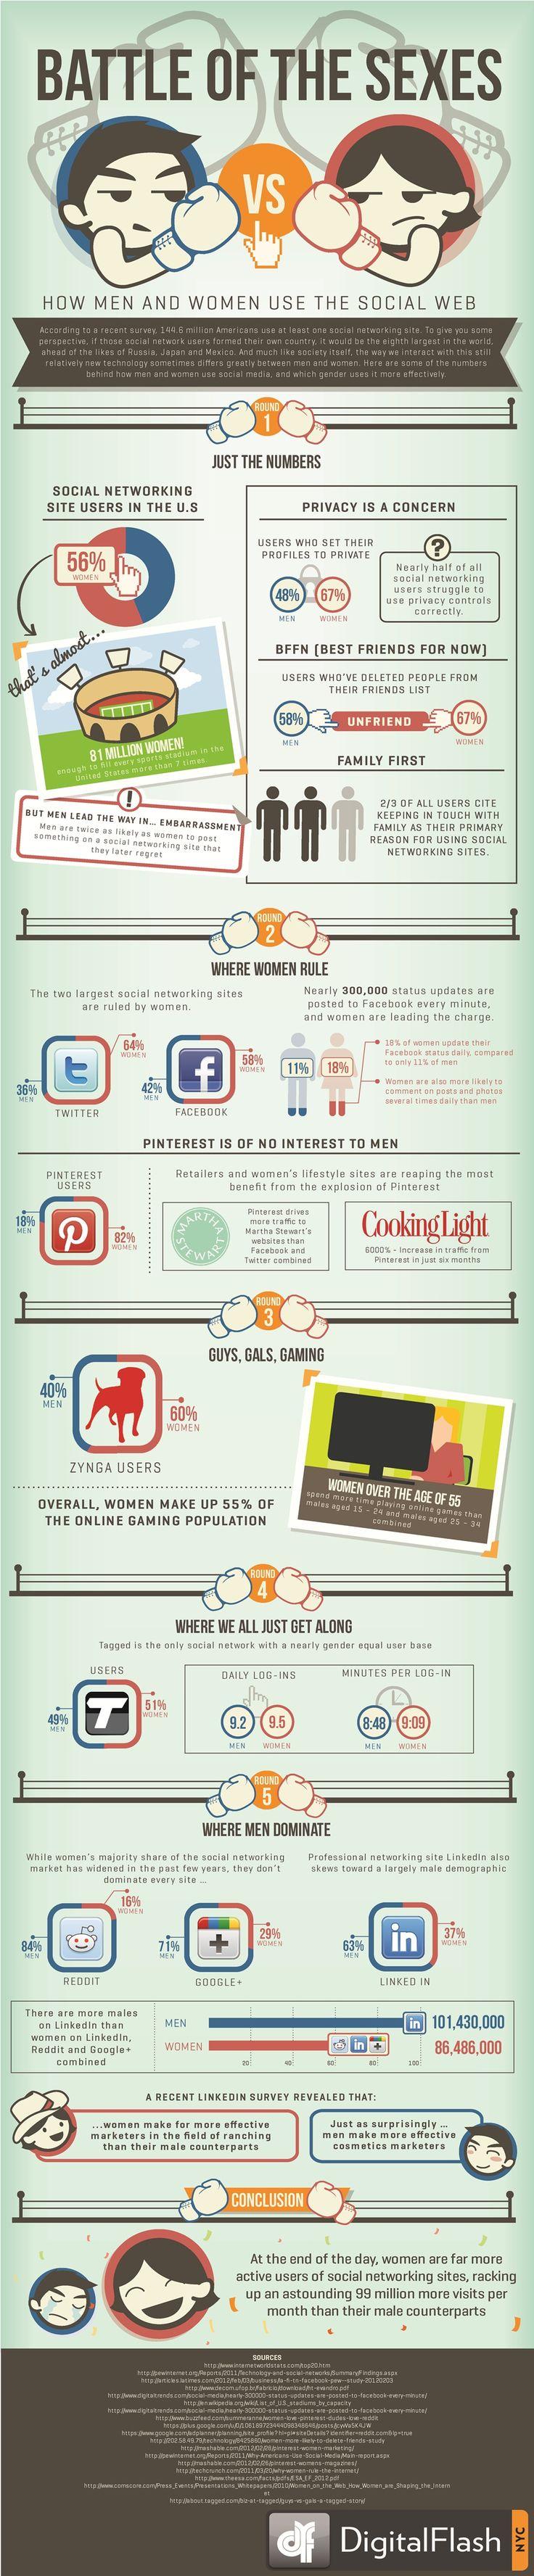 How Do Men And Women Use The Social Web?Social Network, Marketing Strategies, Web Design, Social Media, Social Web, Infographic, Socialmedia, Menvswomen, Men Vs Women